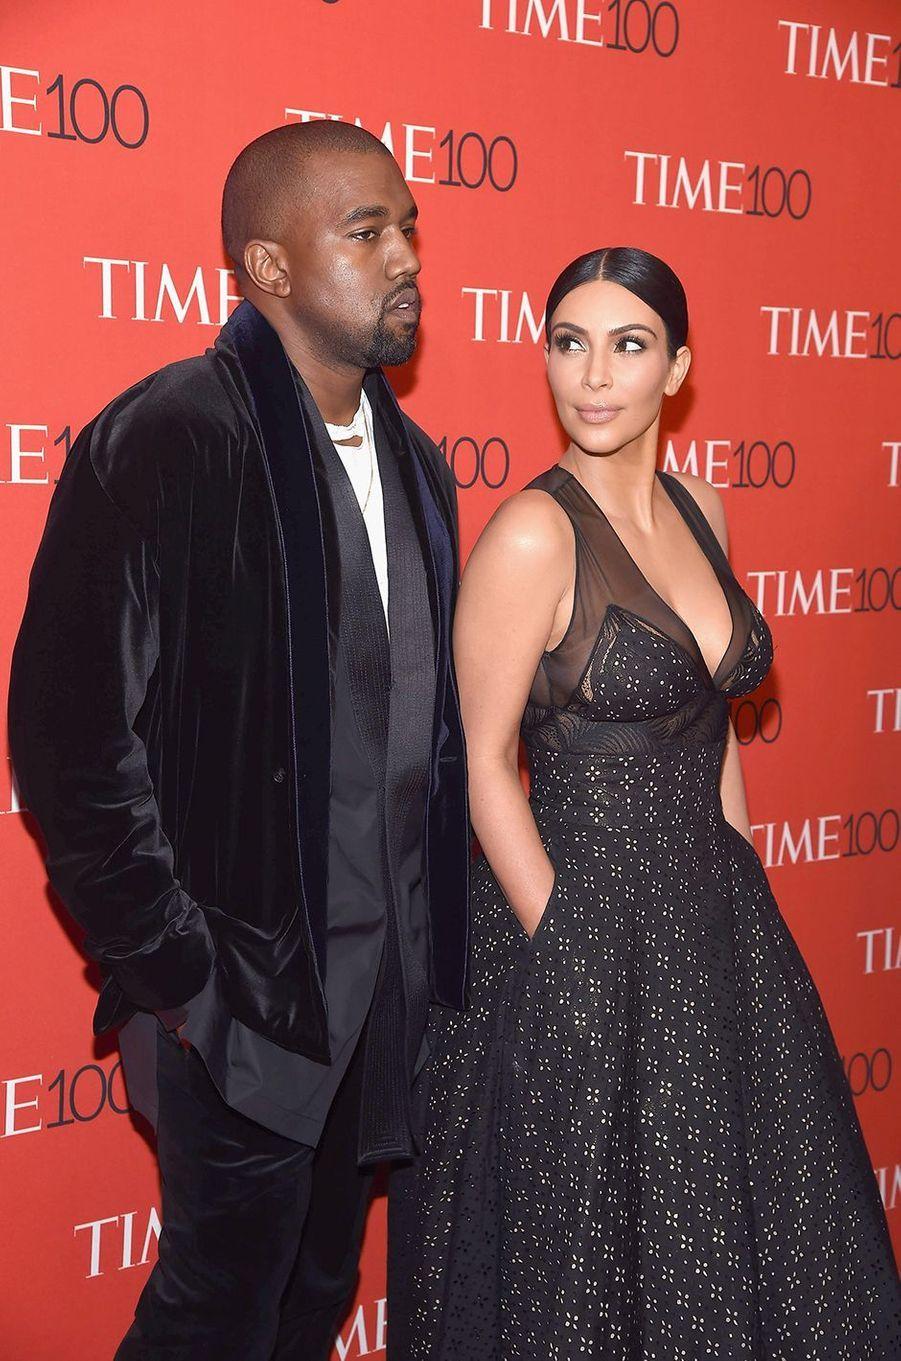 Kanye West et Kim Kardashian à la soirée «Time 100» à New York en avril 2015